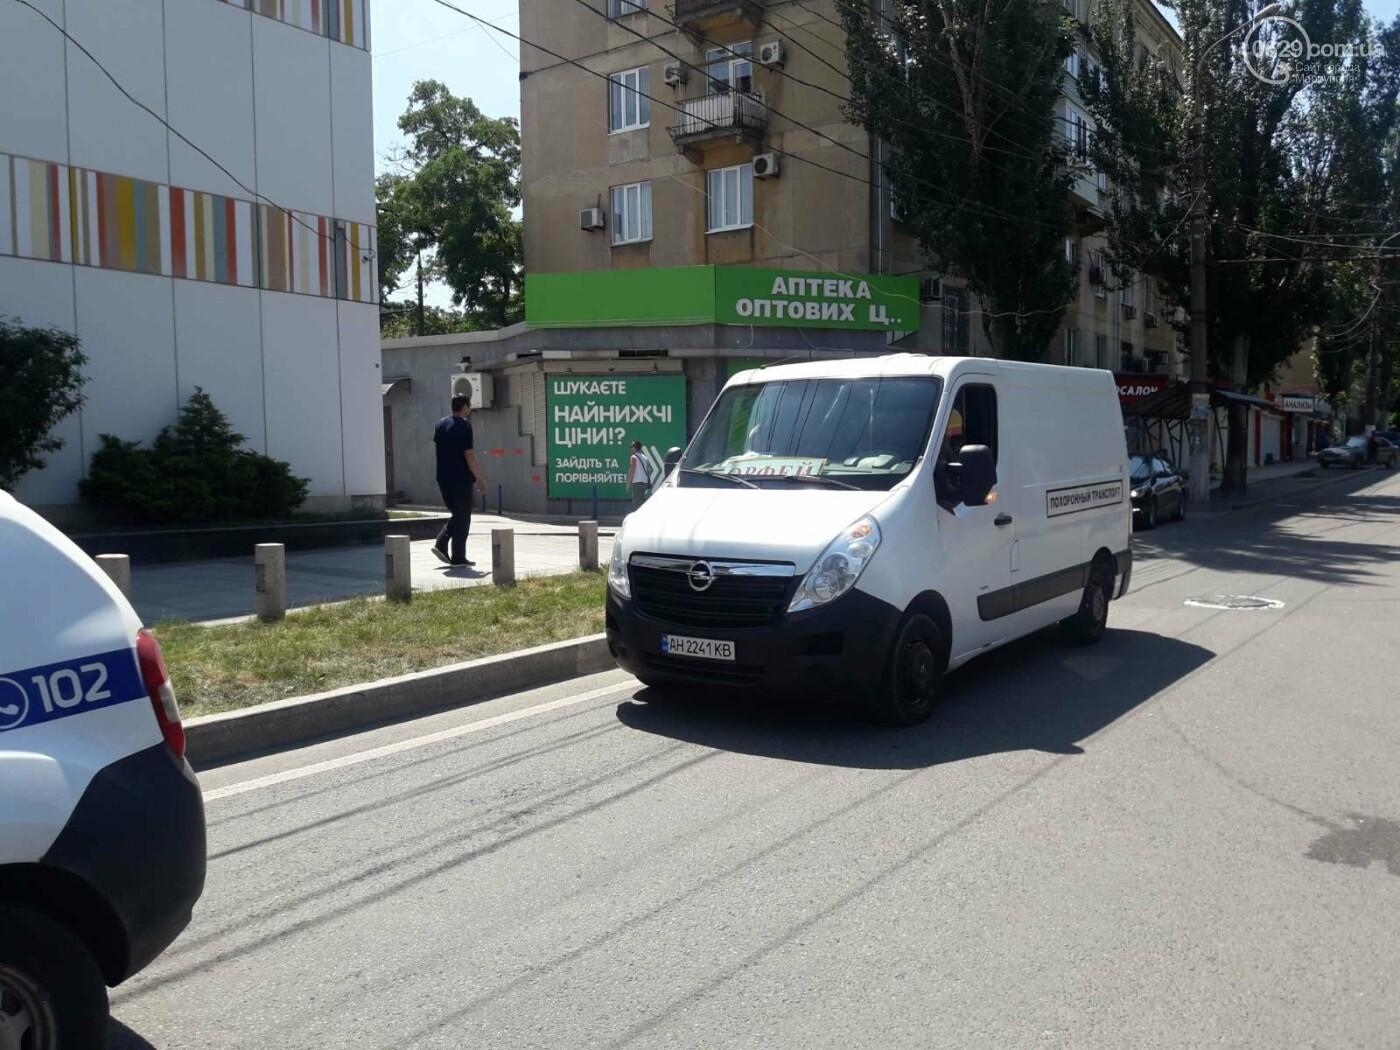 В центре Мариуполя внезапно умер мужчина, - ФОТО, фото-2